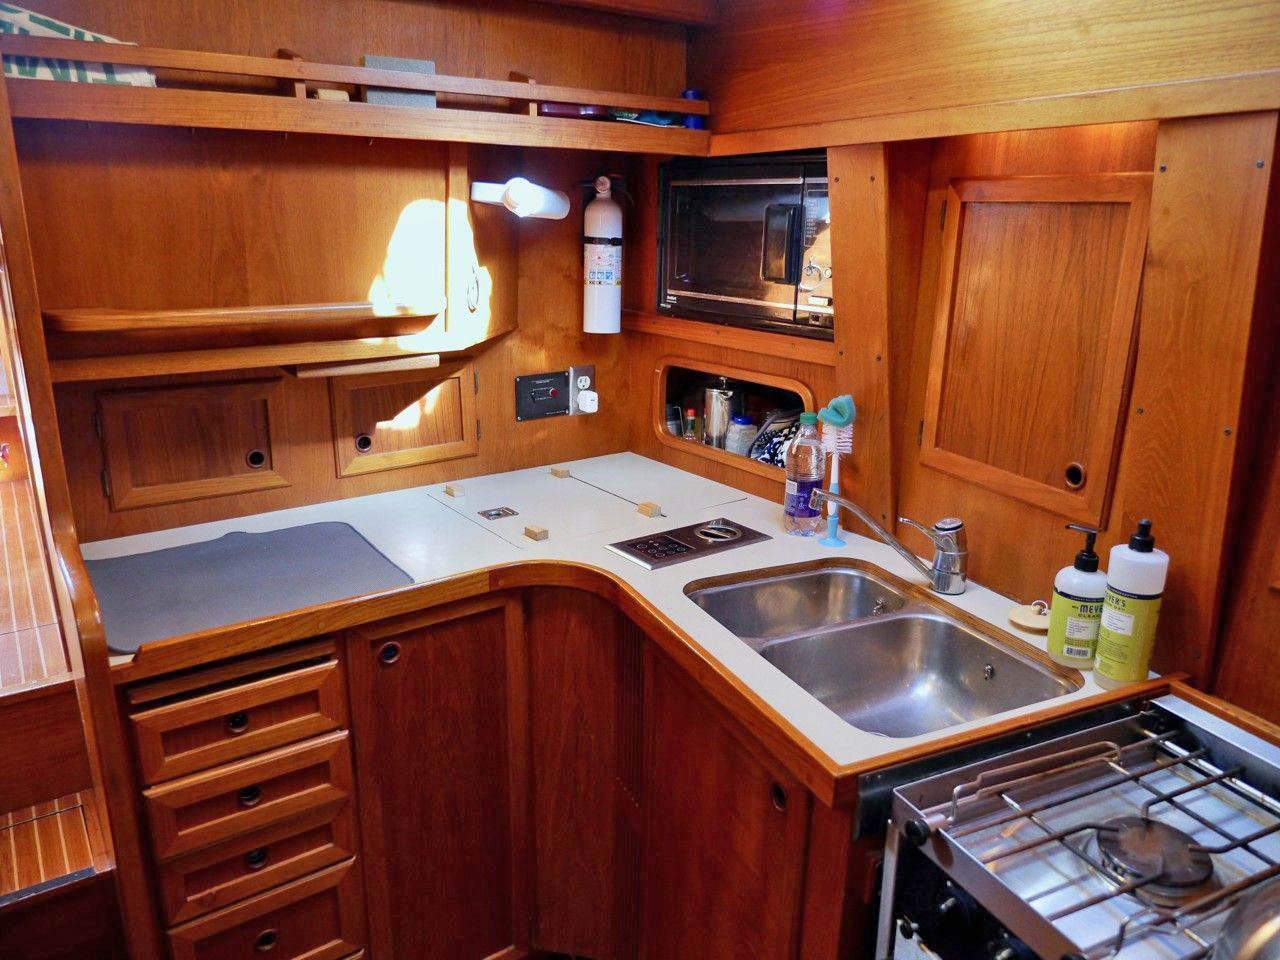 Nauticat 40 Pilothouse sailboat in Tacoma - By Appt, Washington-USA